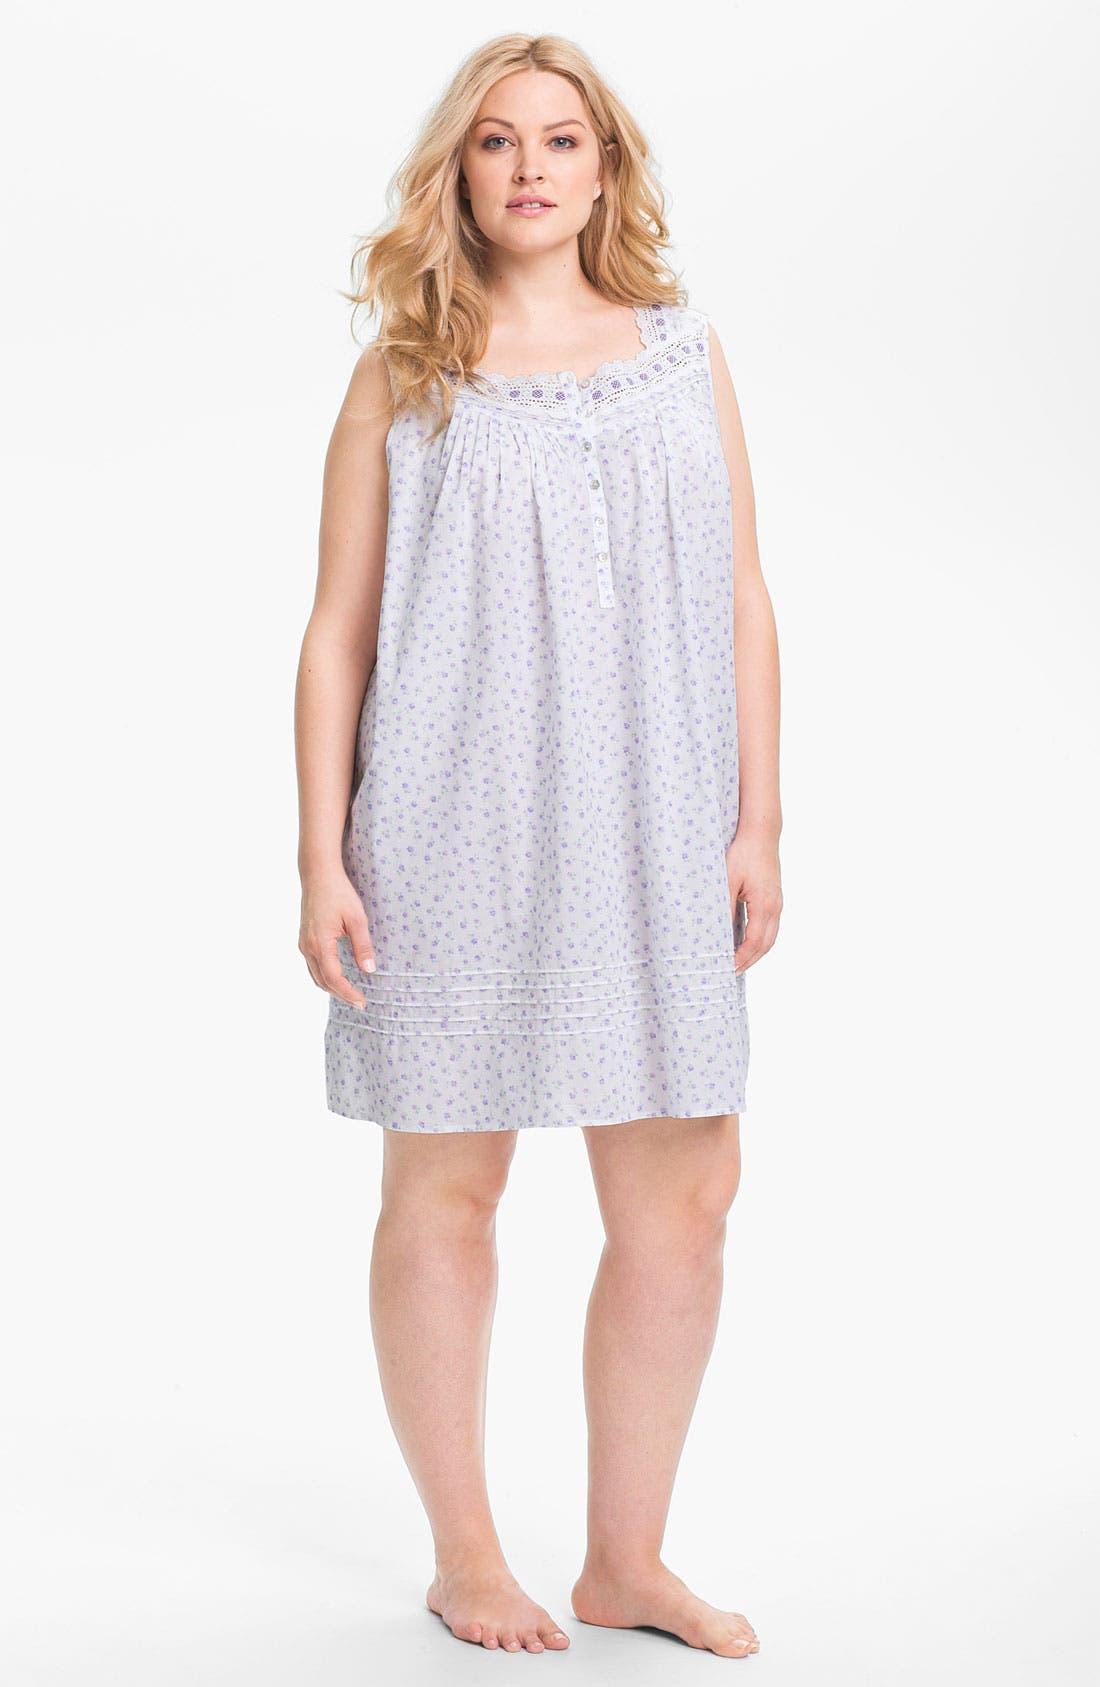 Alternate Image 1 Selected - Eileen West 'Beautiful Heart' Short Nightgown (Plus)